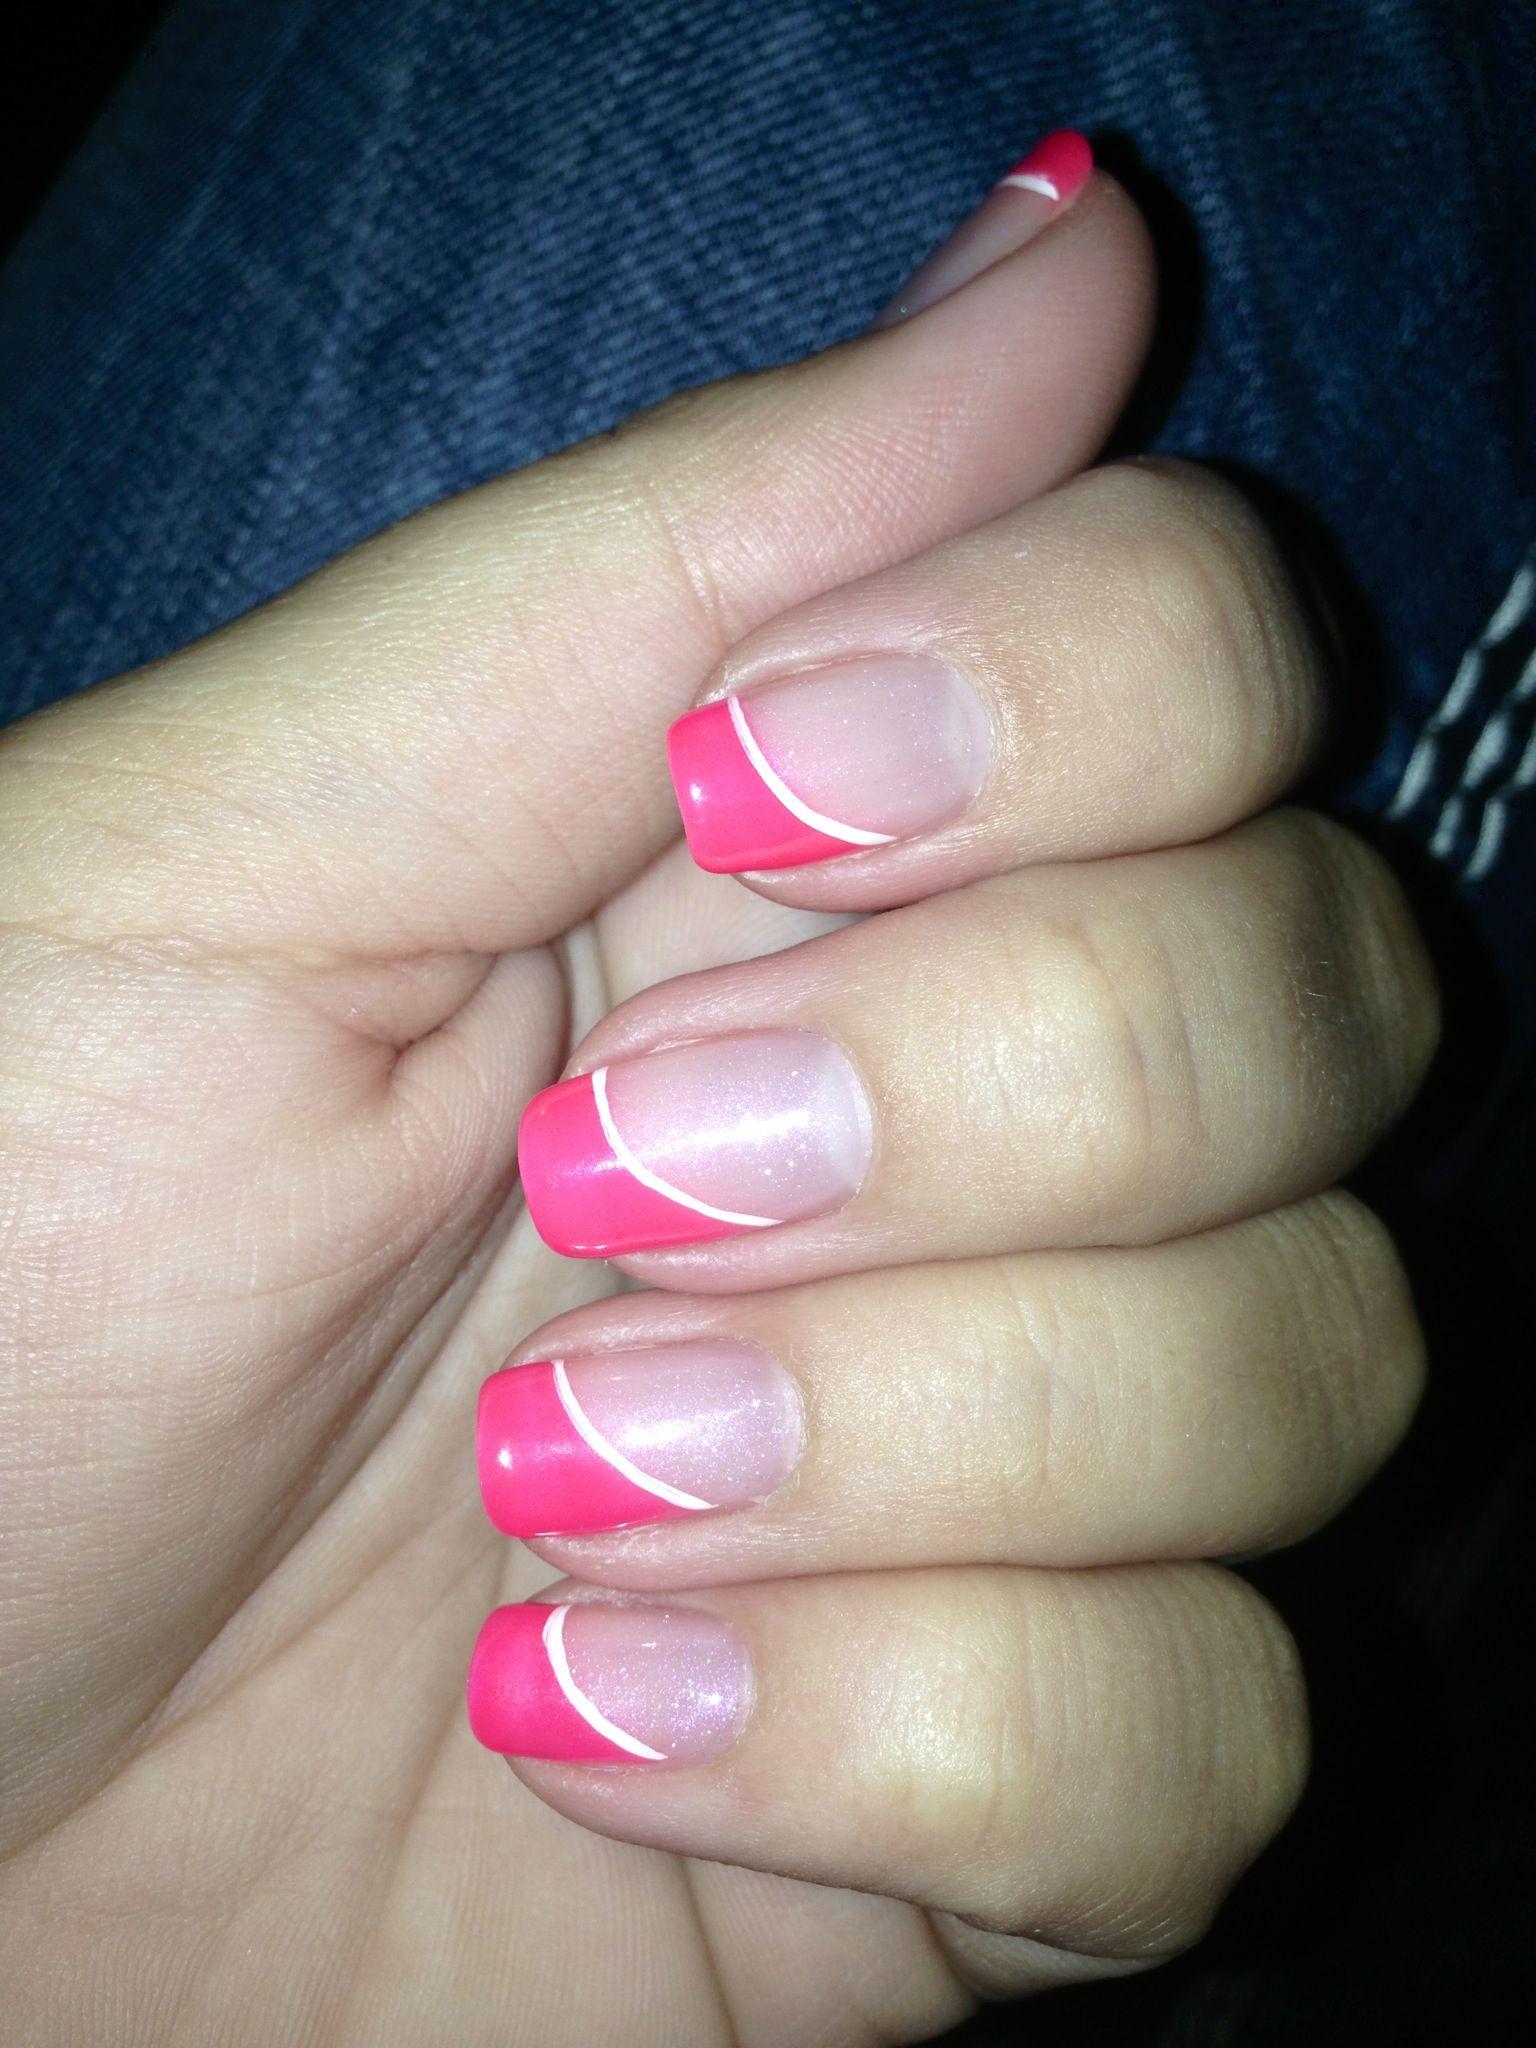 Pink Slant French Manicure   Beauty - Nails   Pinterest   Manicure ...